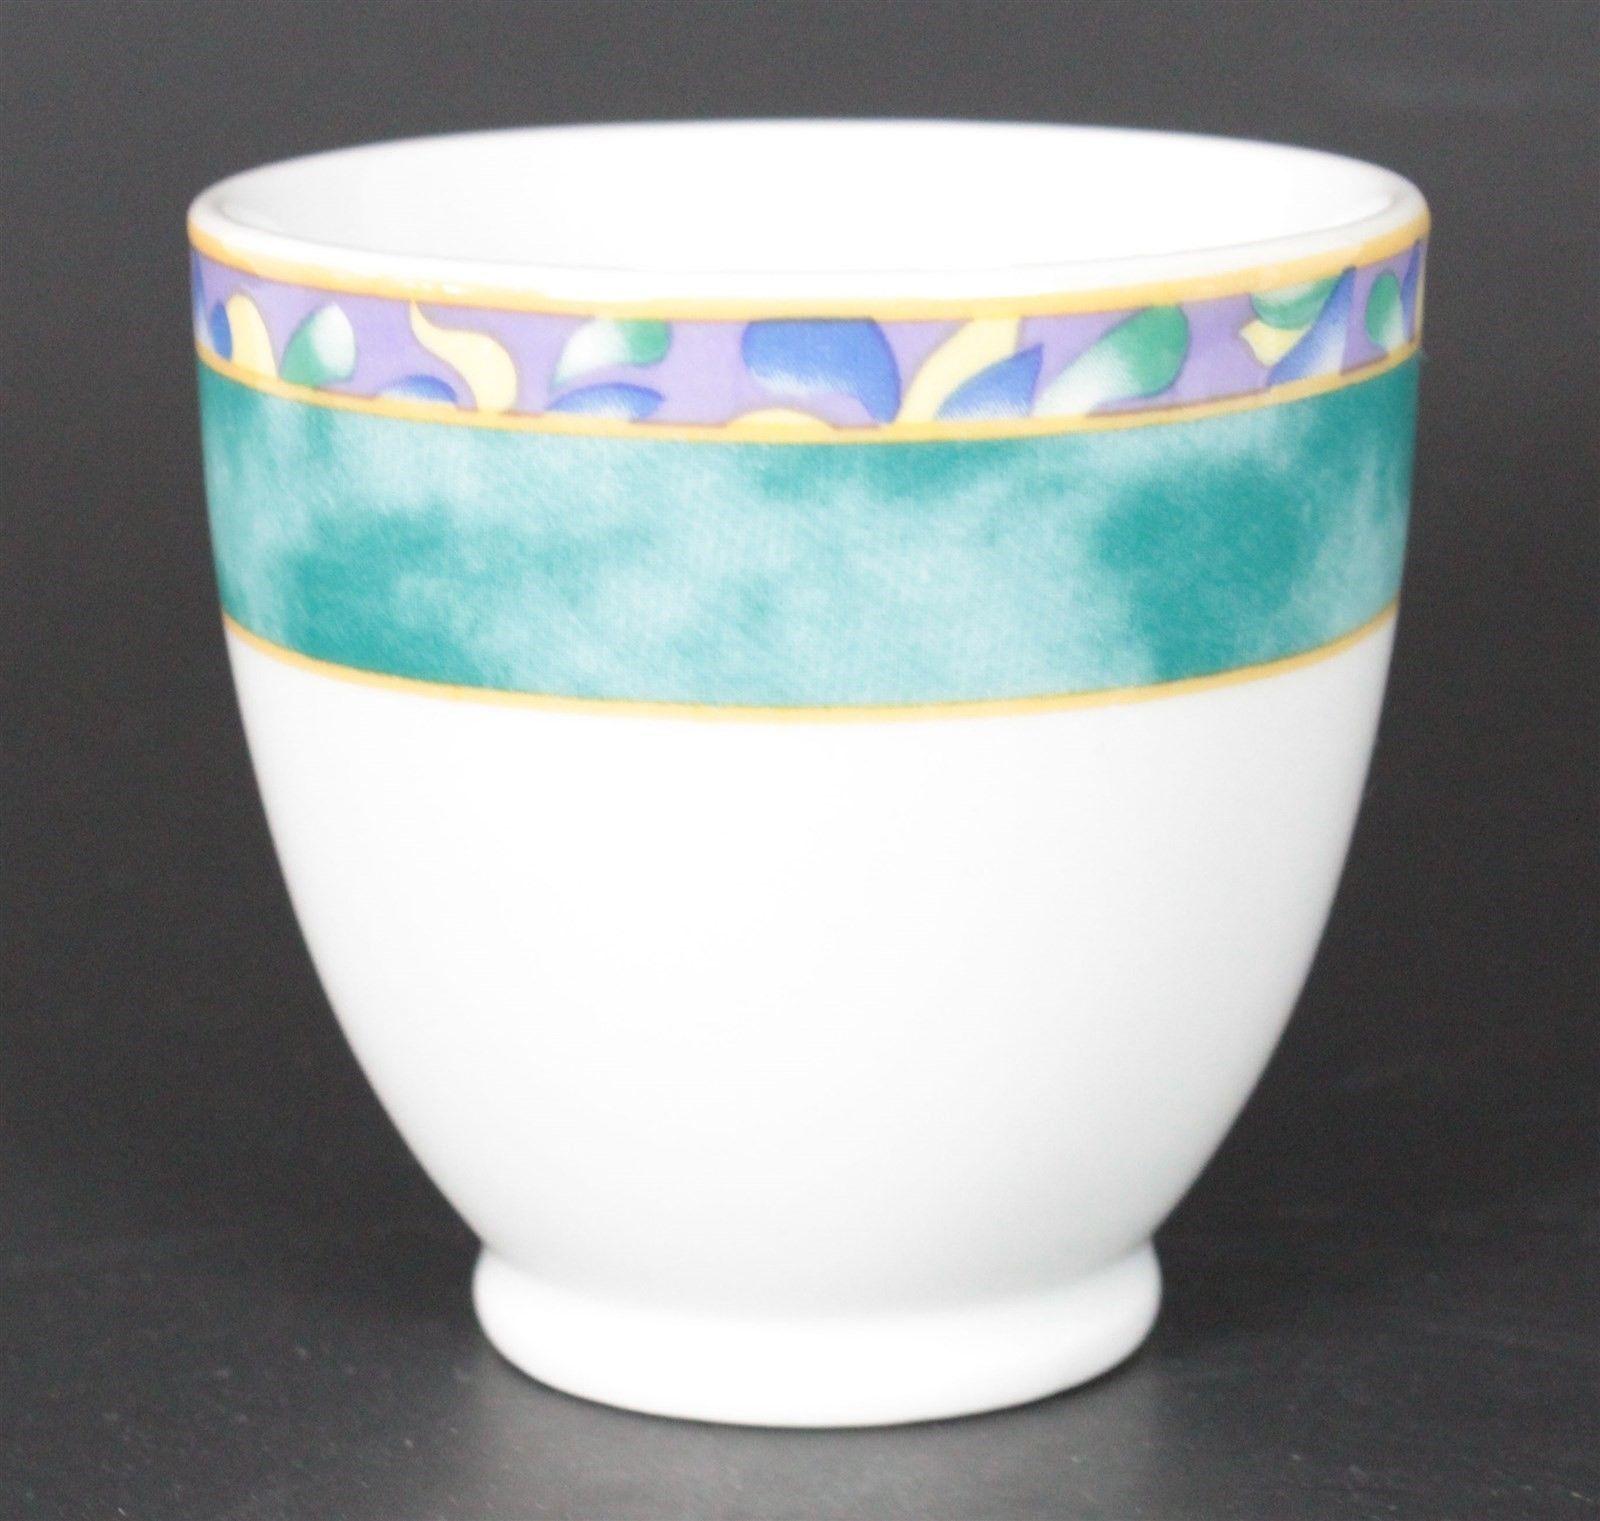 van well wellco design german coffee tea cup mug spulmaschinengeeignet mugs cups